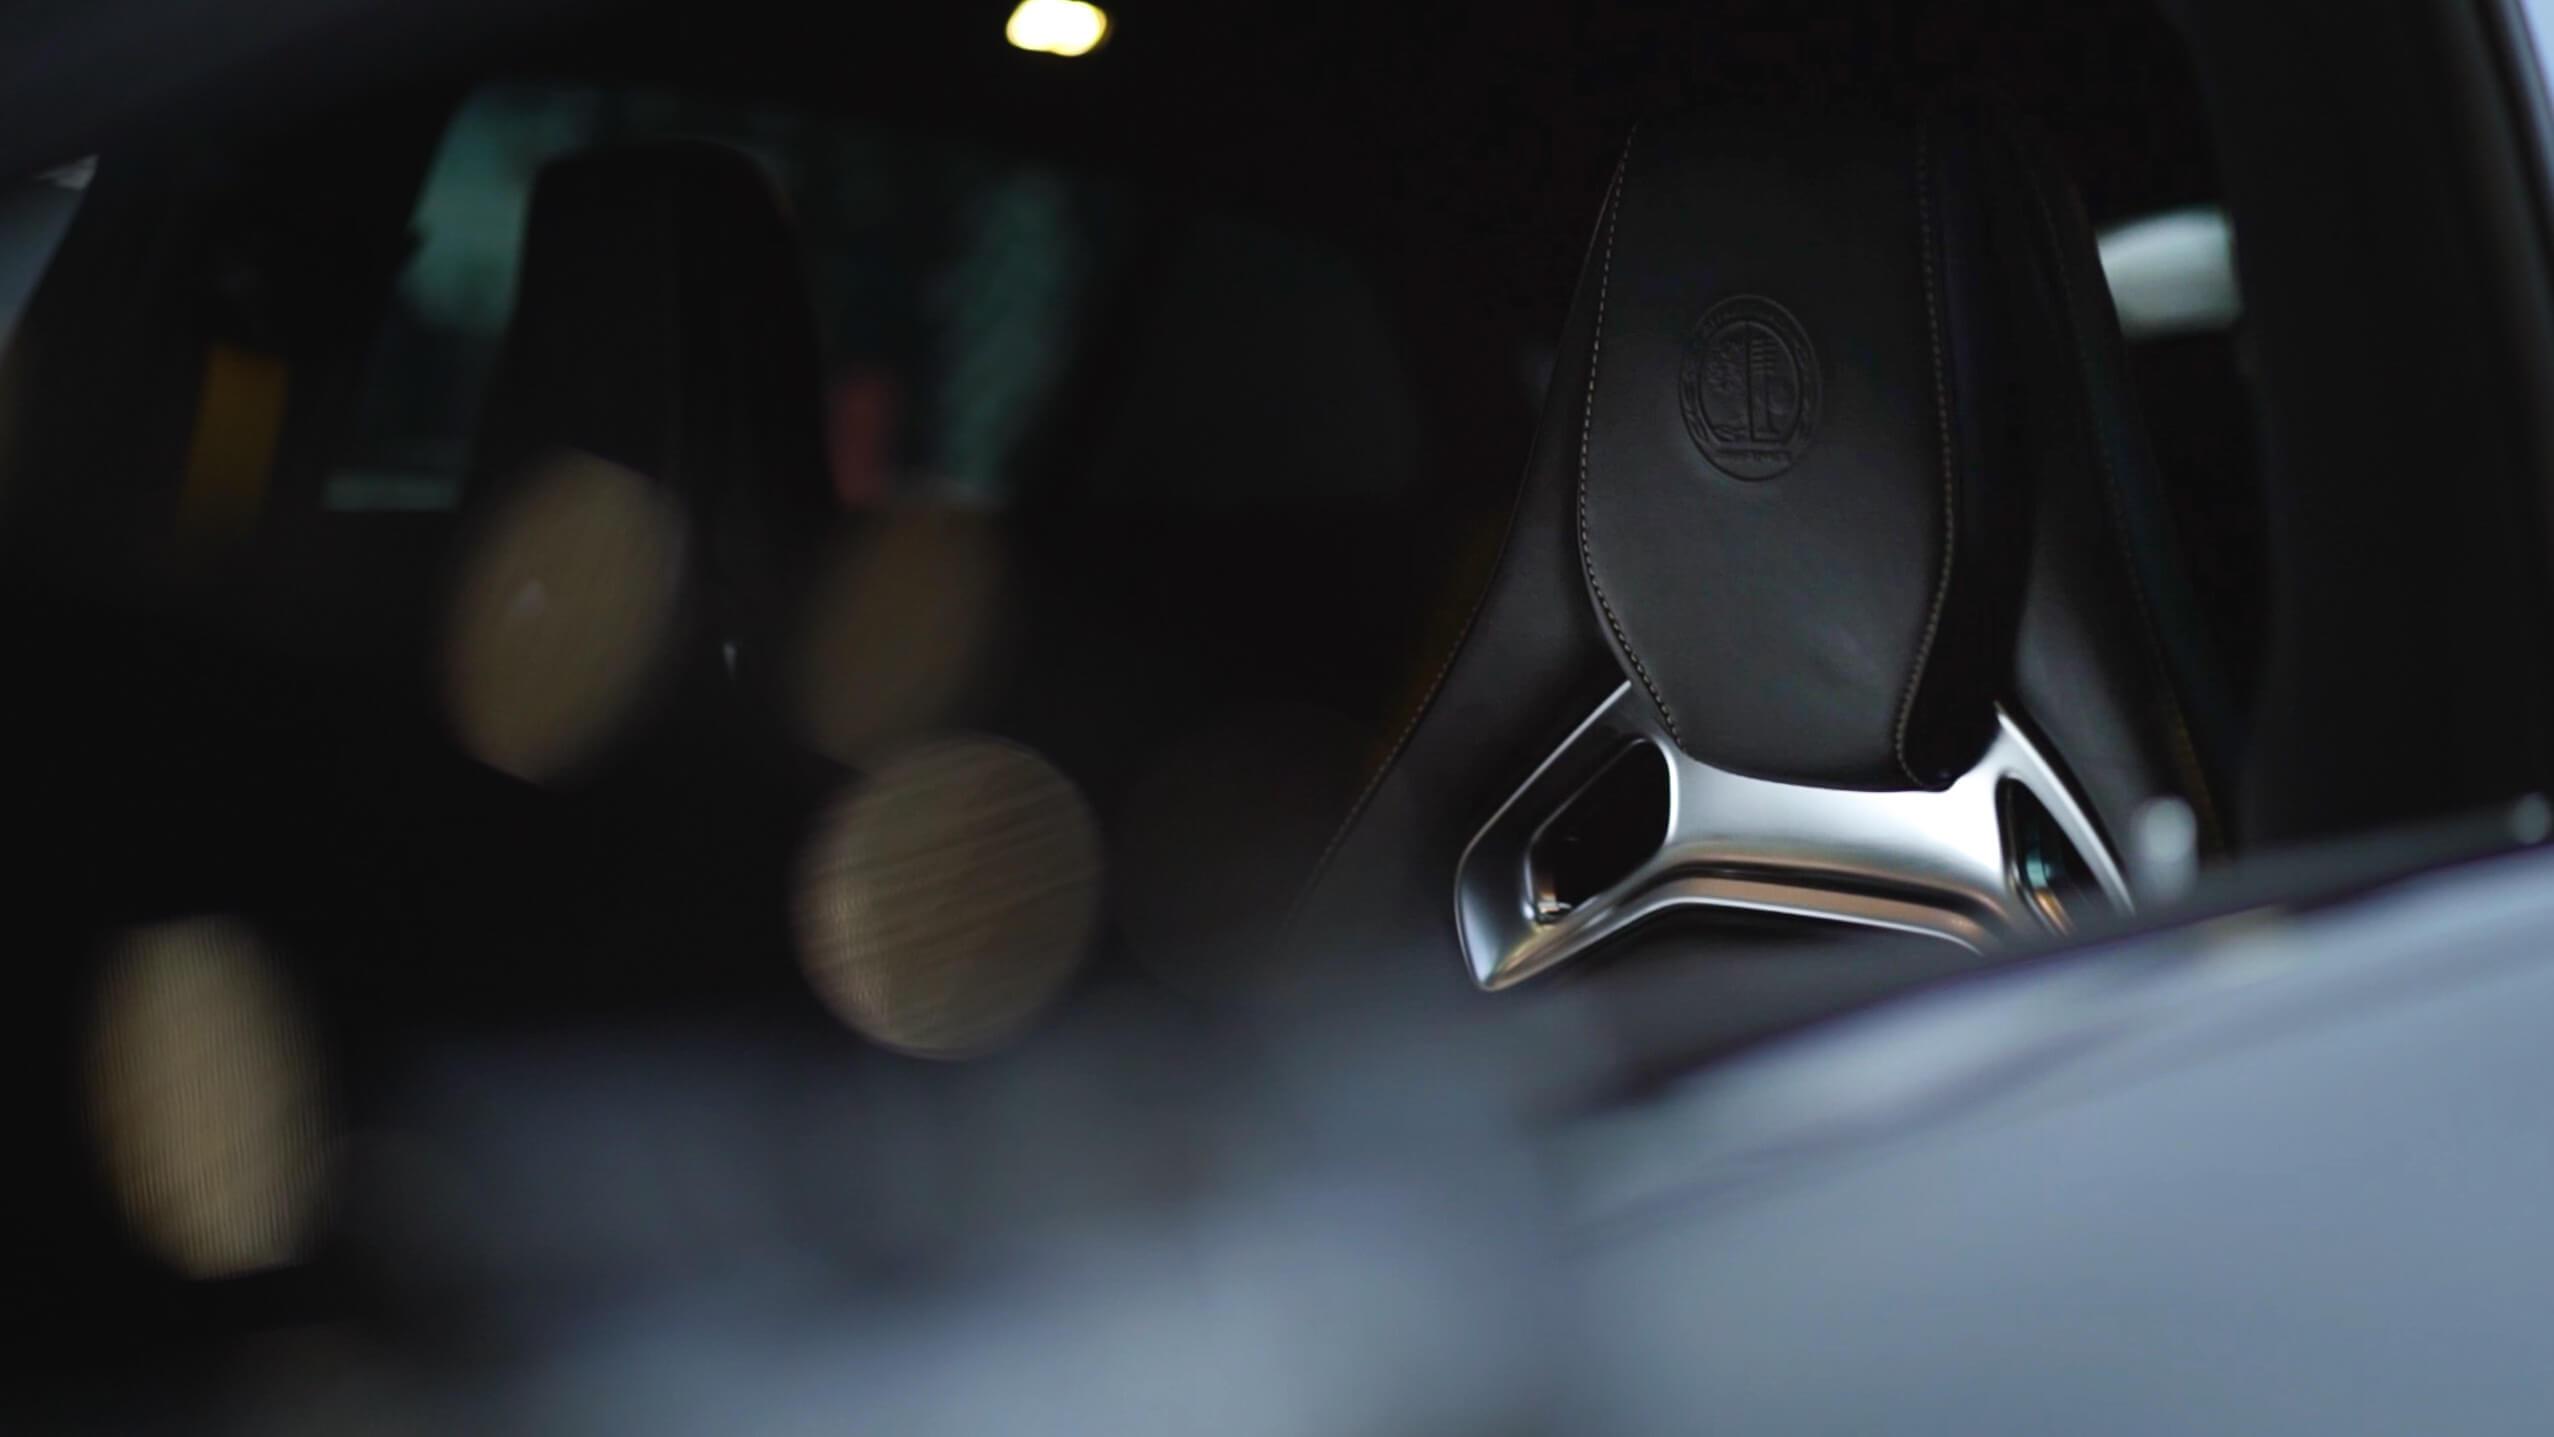 Mercedes Benz The Woodlands – GT 63S